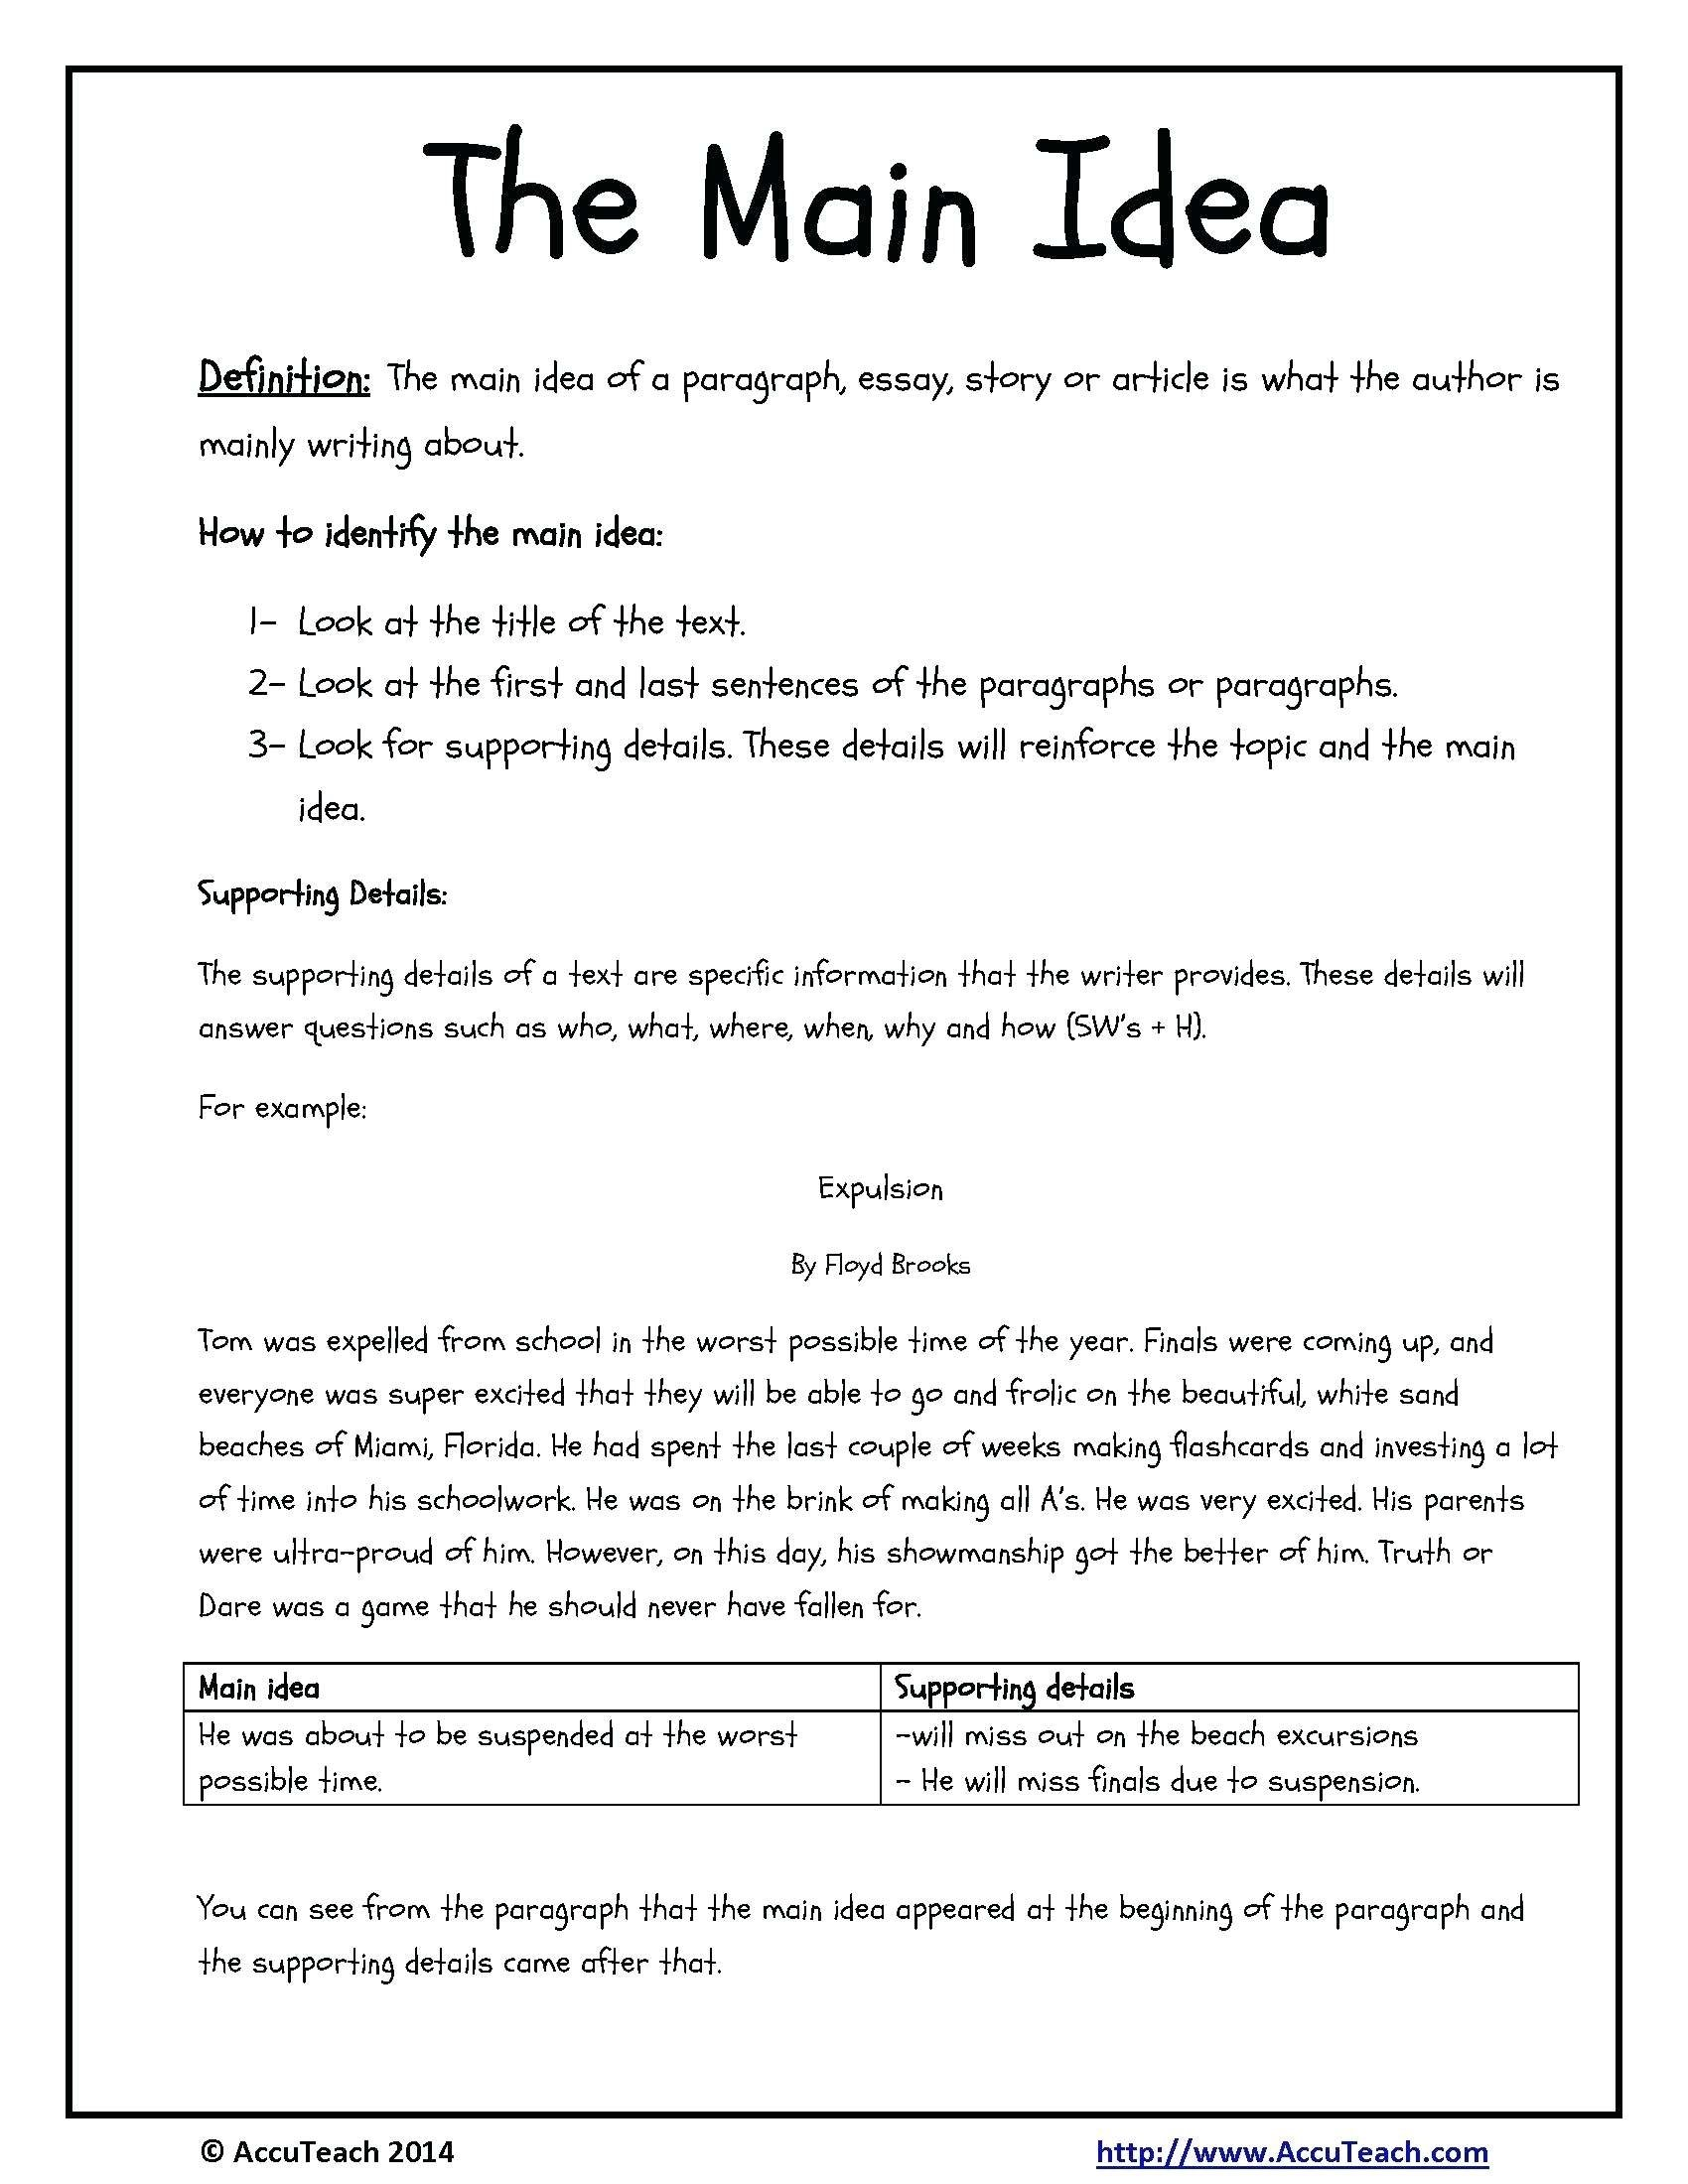 10 Perfect Main Idea Worksheets 4th Grade